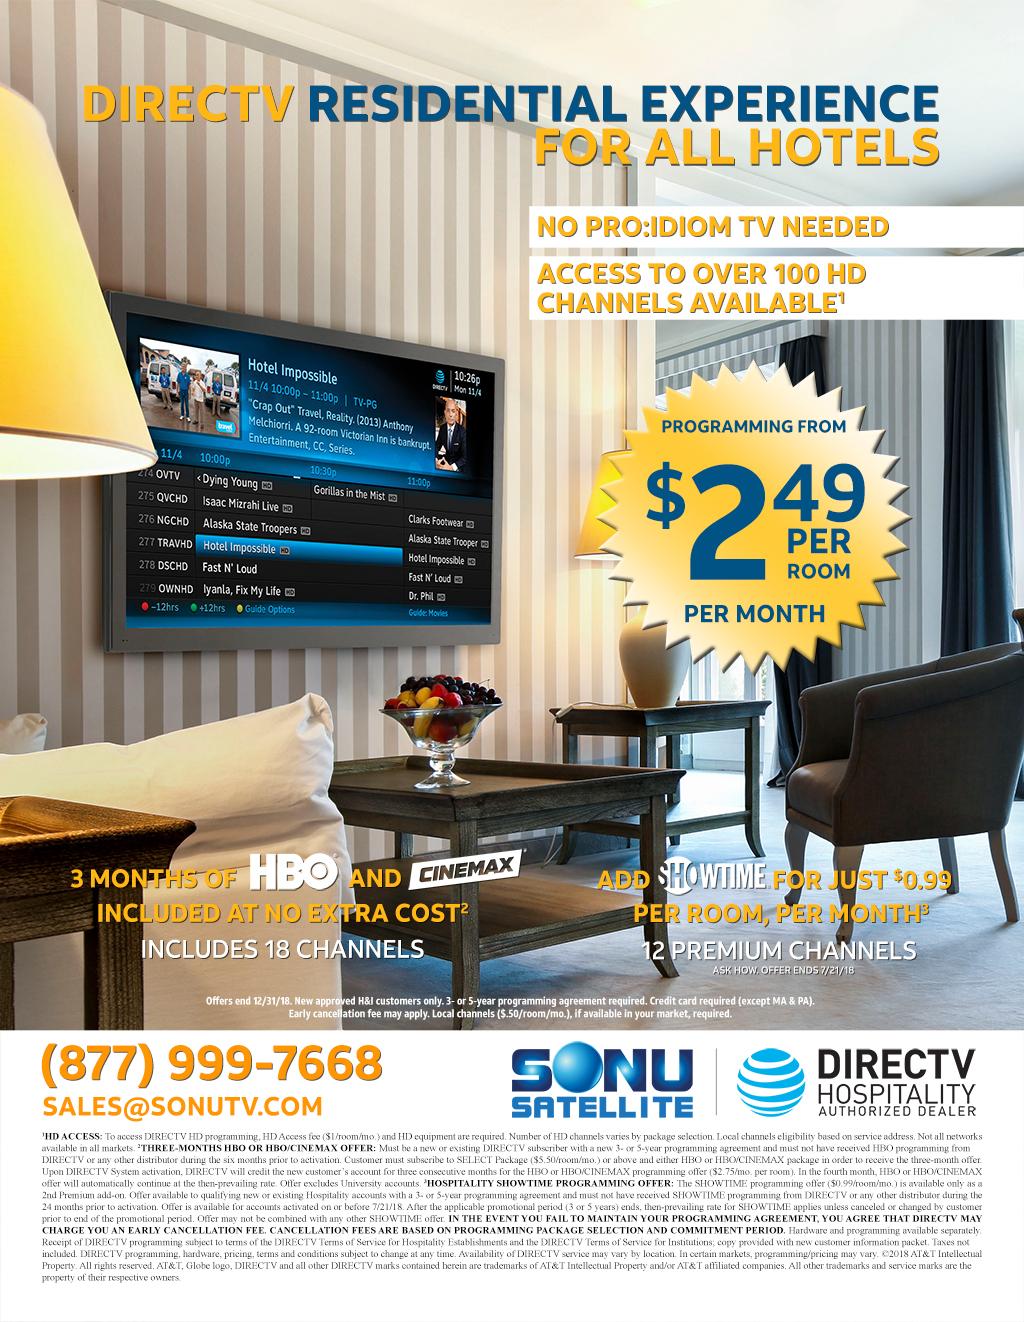 DIRECTV for Hospitality DRE TV for Business 2018